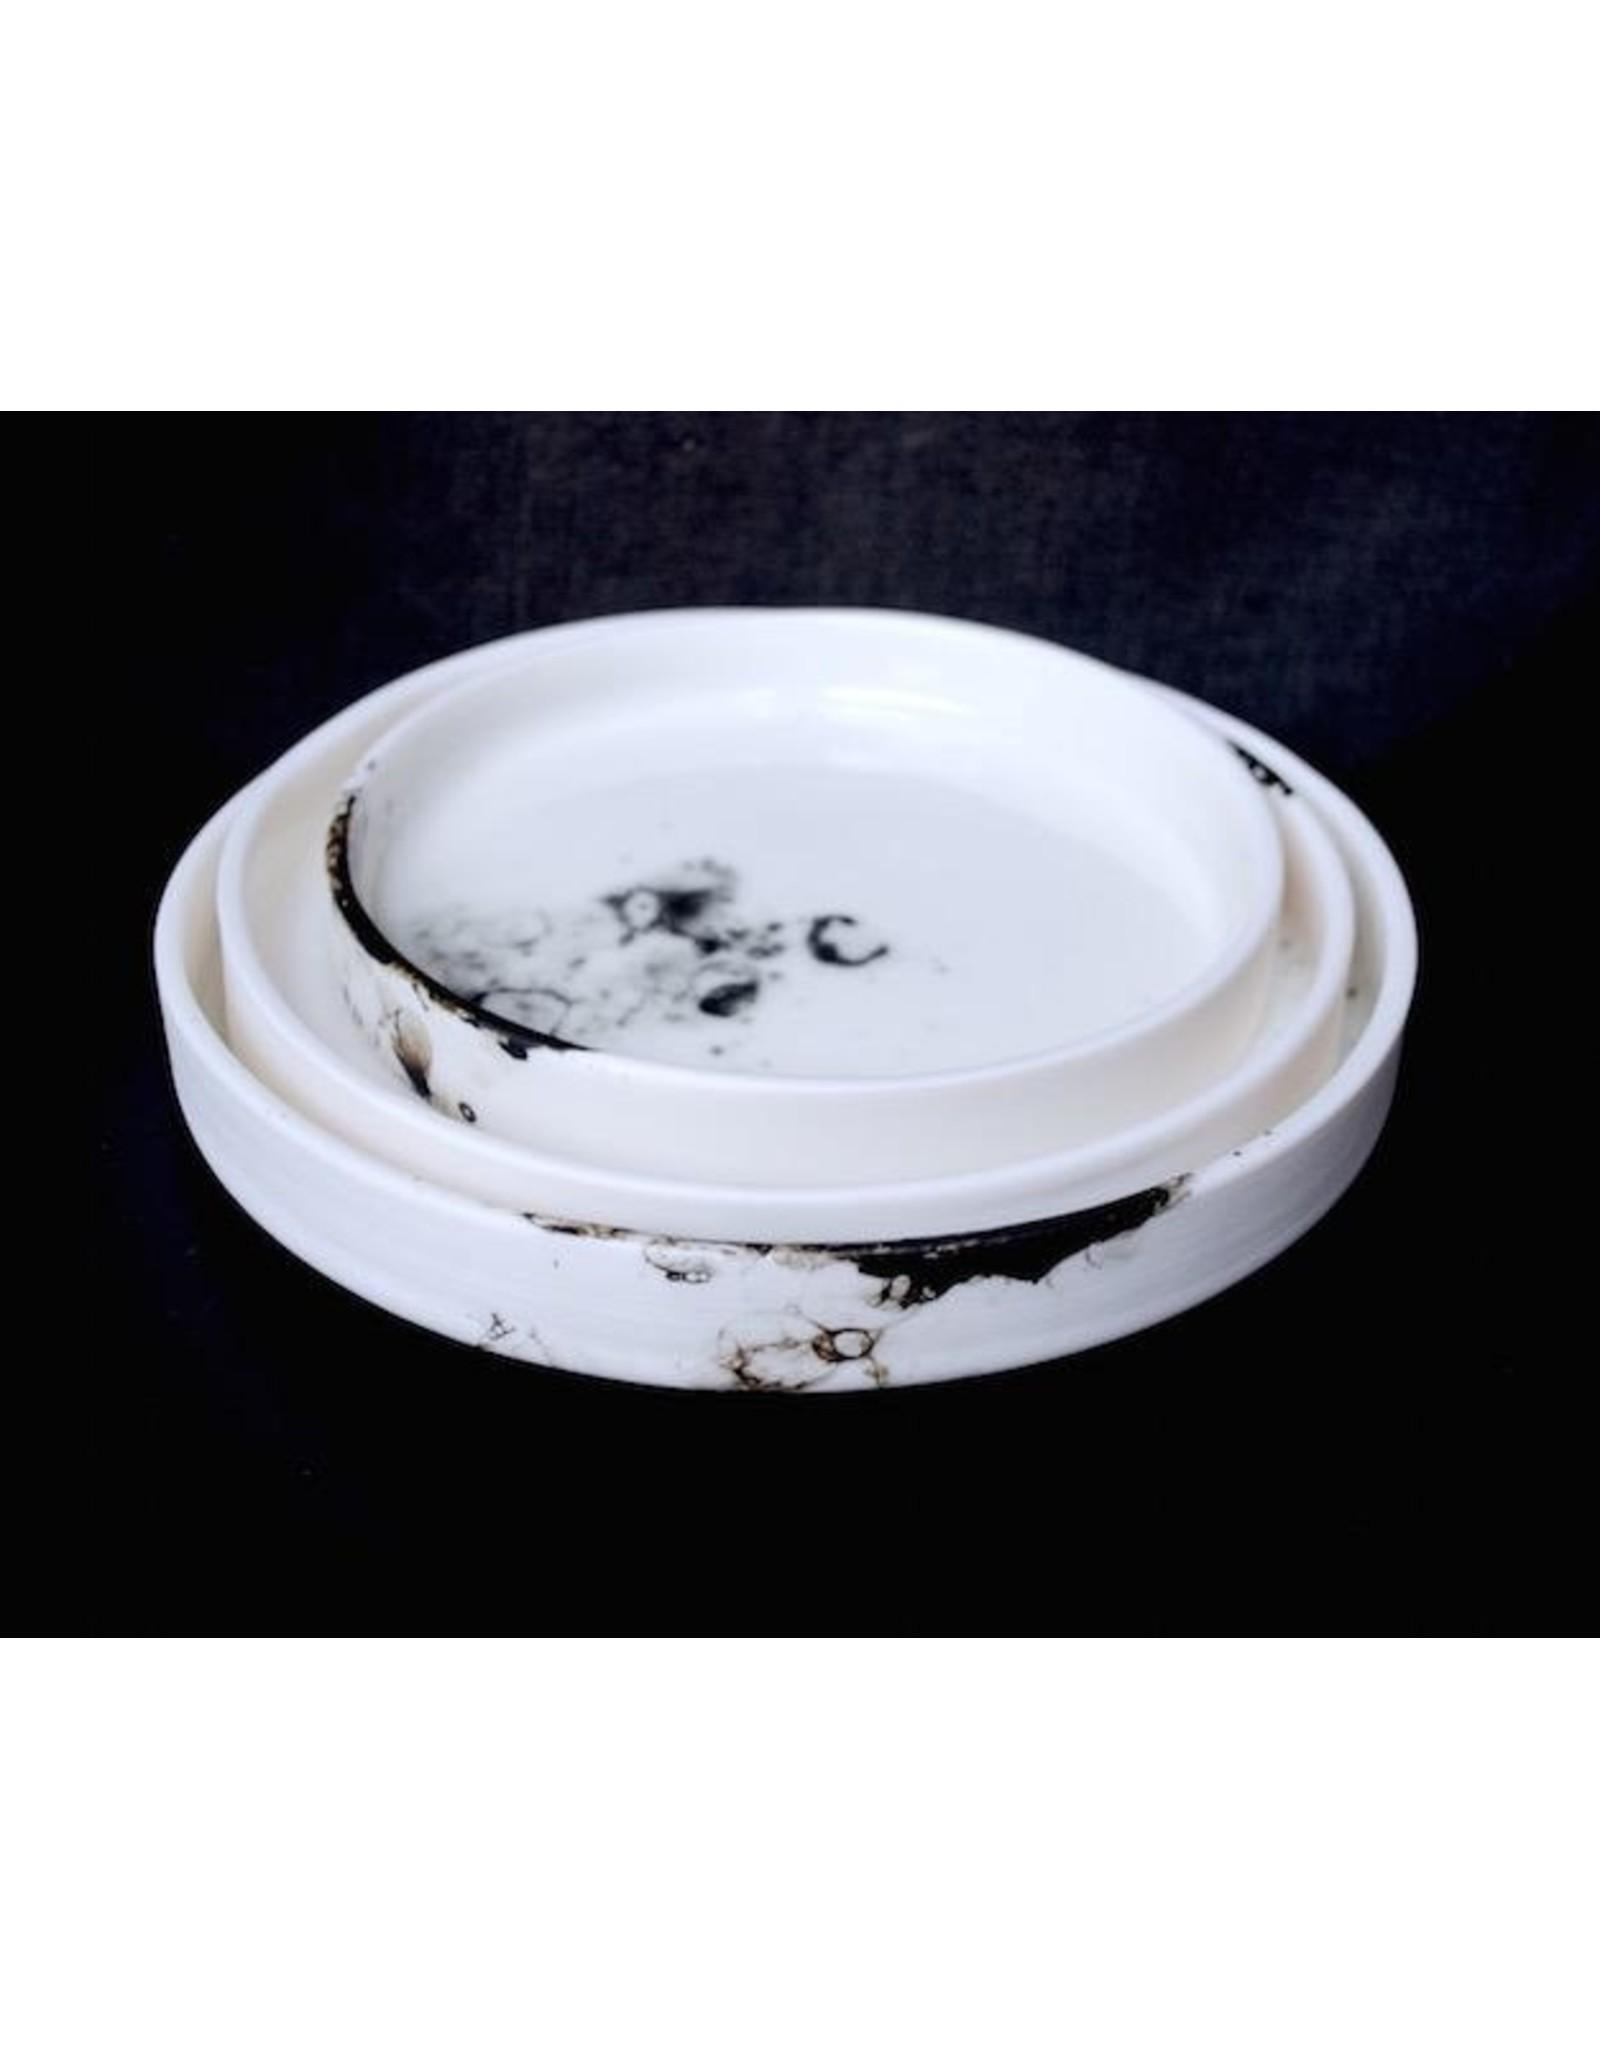 Porcelain Art Studio BONNY (SERVEER)SCHAAL / BORD M D19XH2,5